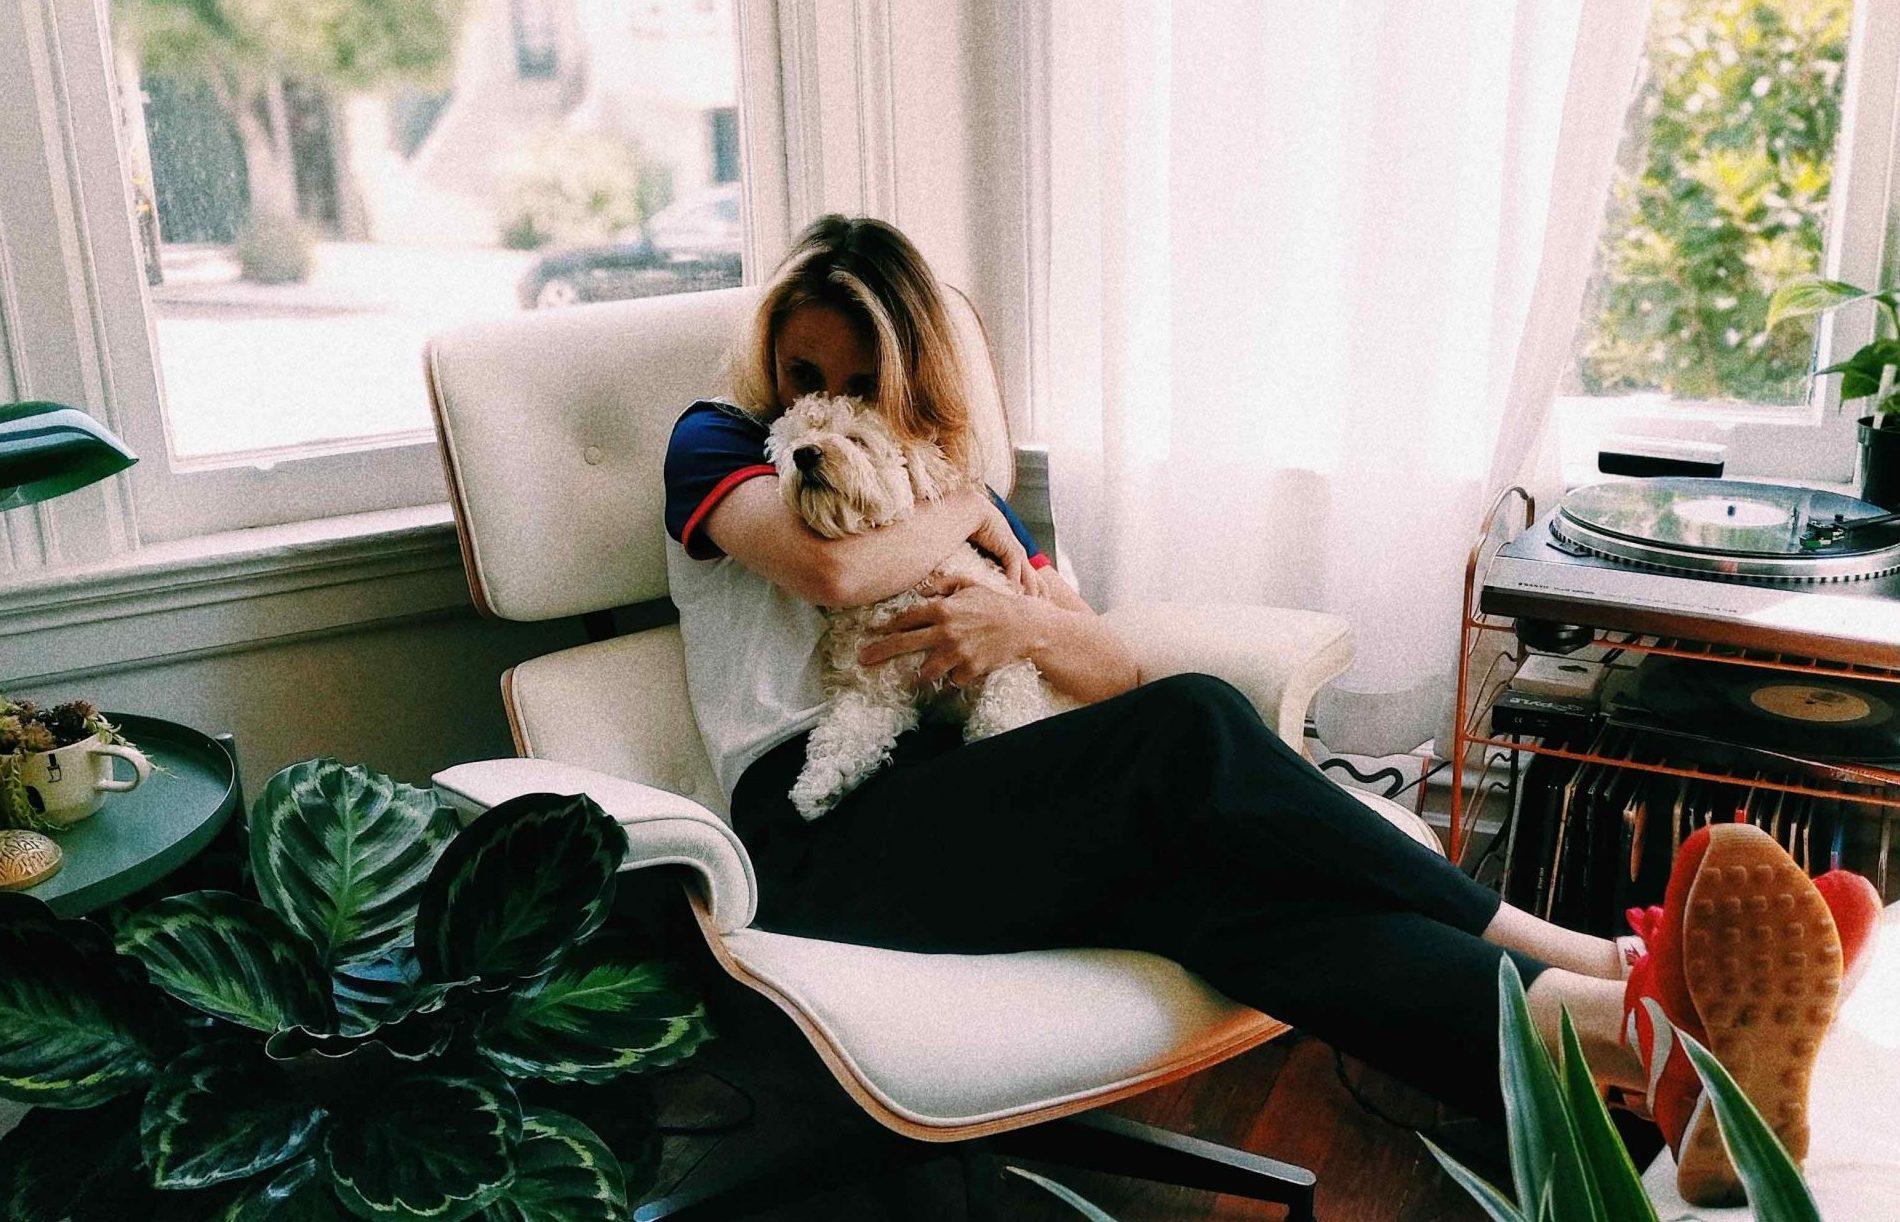 kram, hudsult, kæleedyr, hund